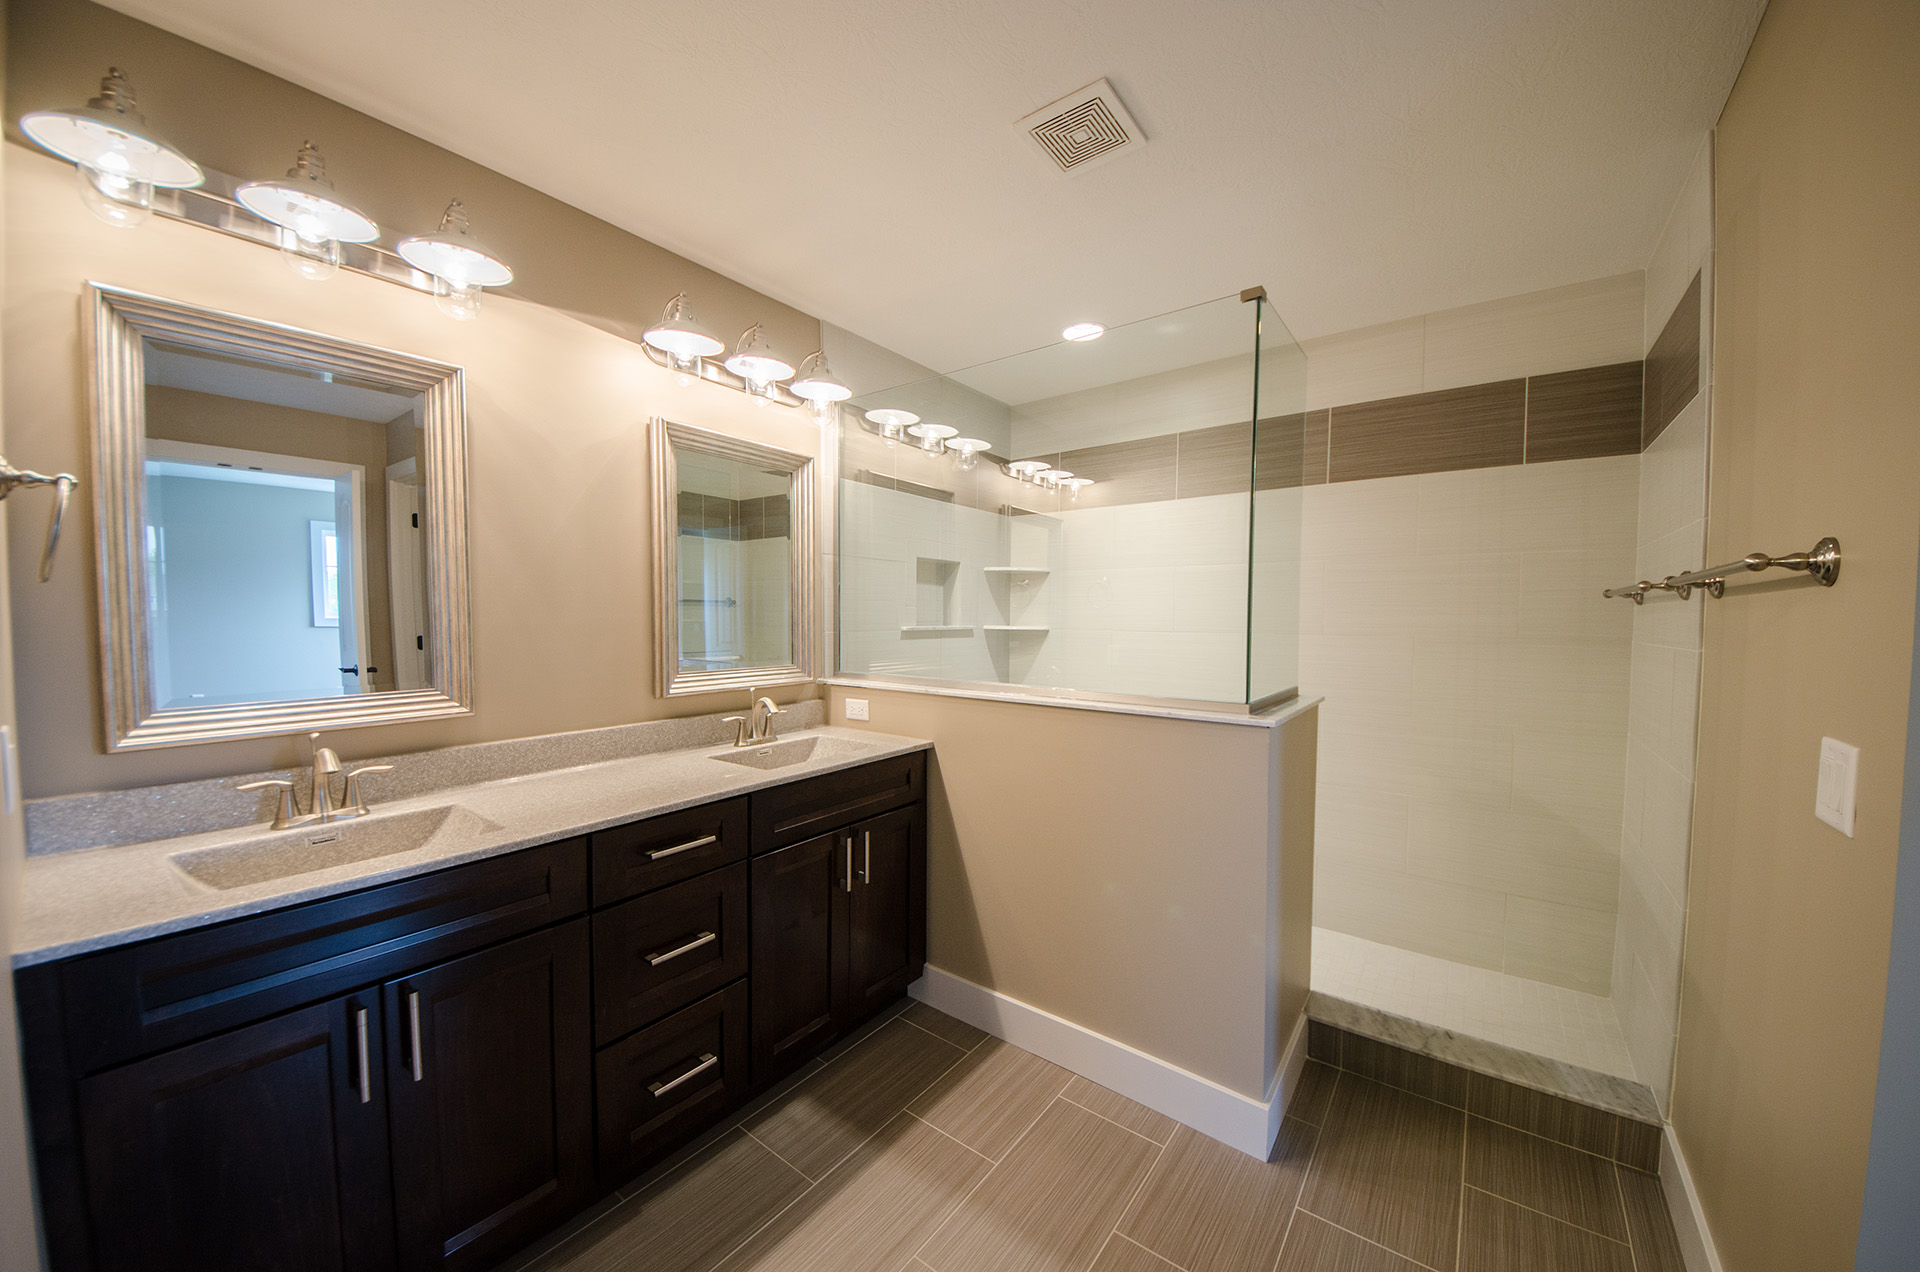 Custom Bathroom By Design Homes And Development. Built By Design Homes U0026  Development.